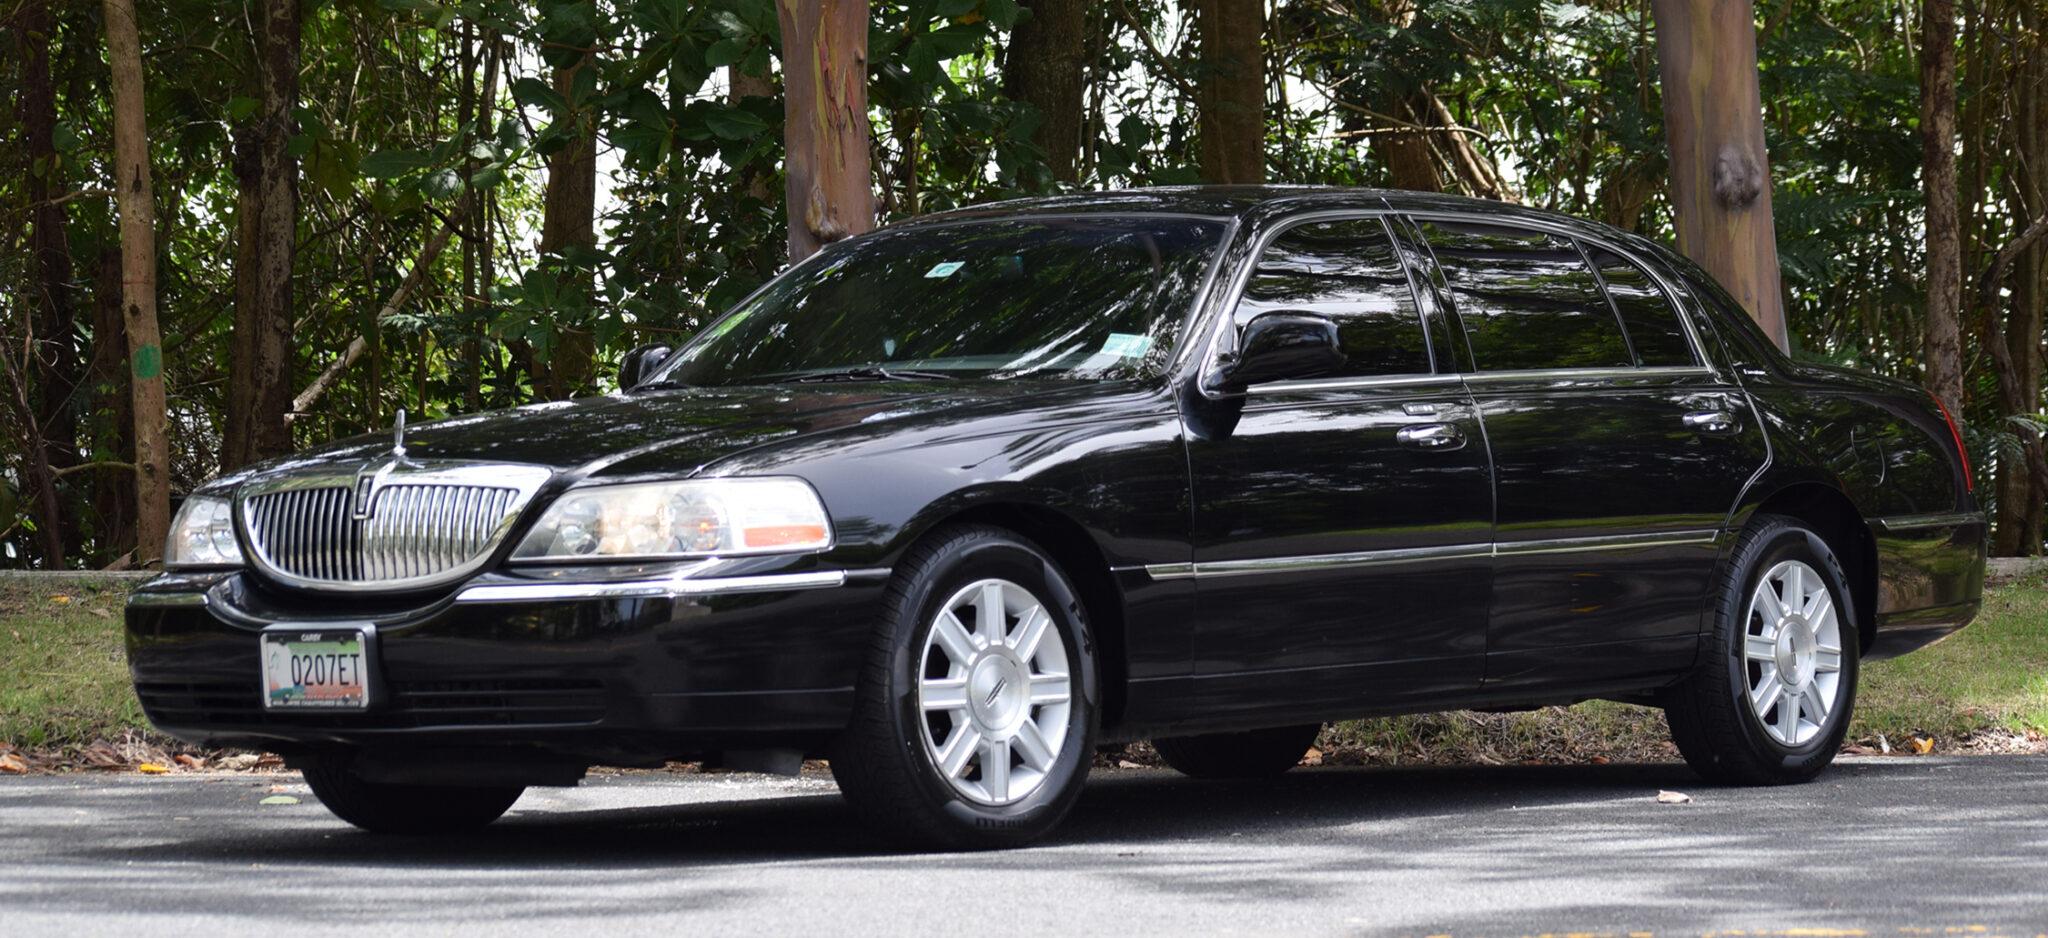 Black Sedan